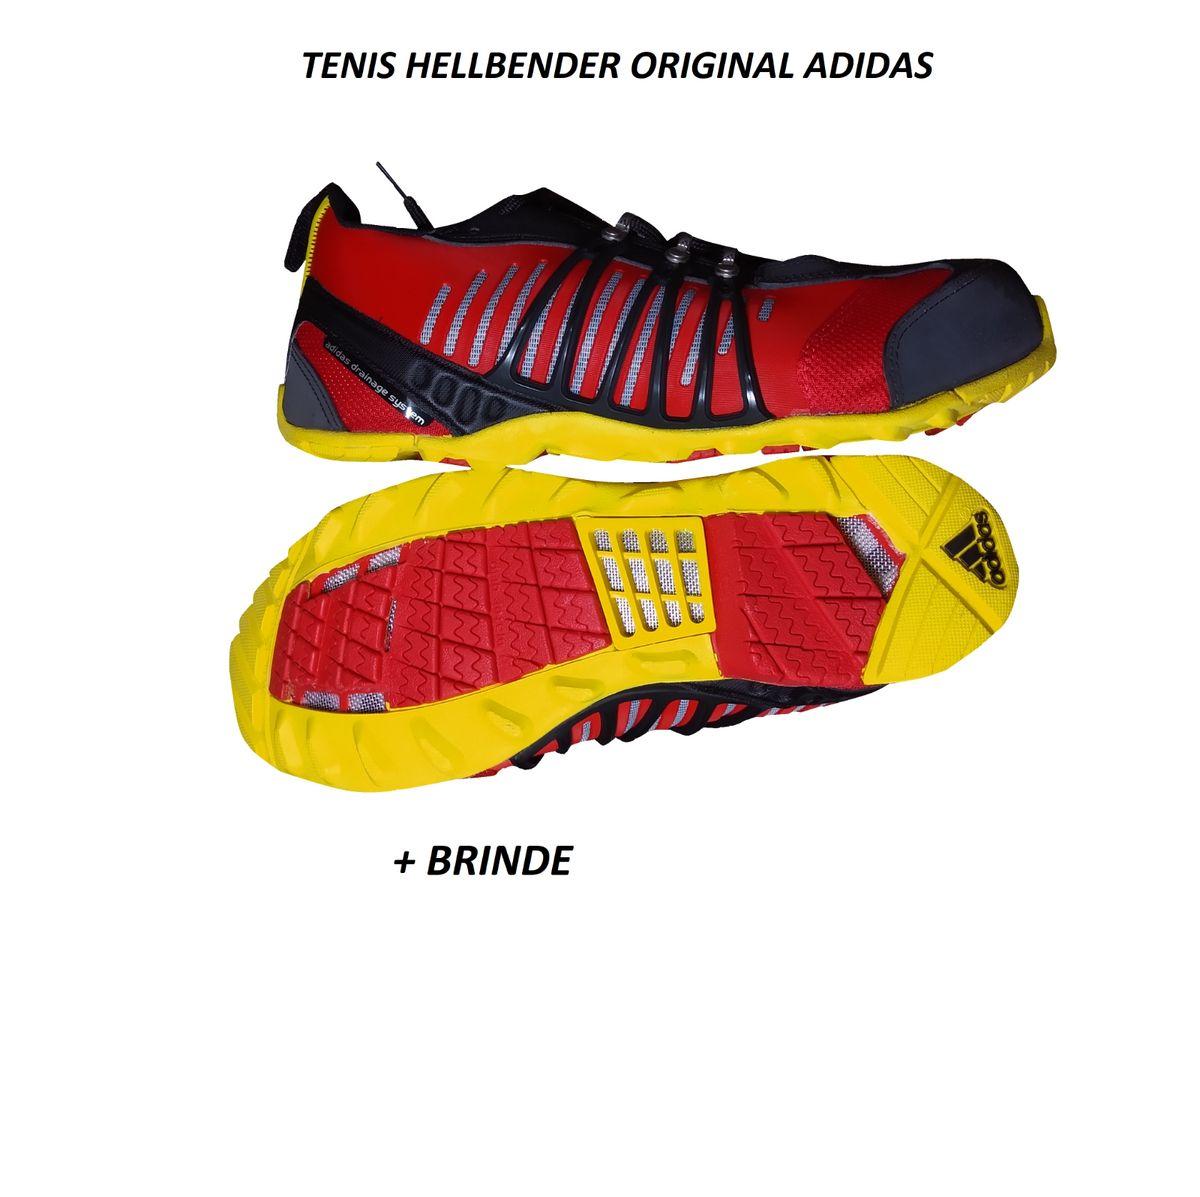 53245a71d71 tênis adidas hellbender original - tênis adidas.  Czm6ly9wag90b3muzw5qb2vplmnvbs5ici9wcm9kdwn0cy8xmdqxnjg3my80zdy3yjfjywjjntflmja5ngfimdczogy2yzbkn2uxmi5qcgc  ...